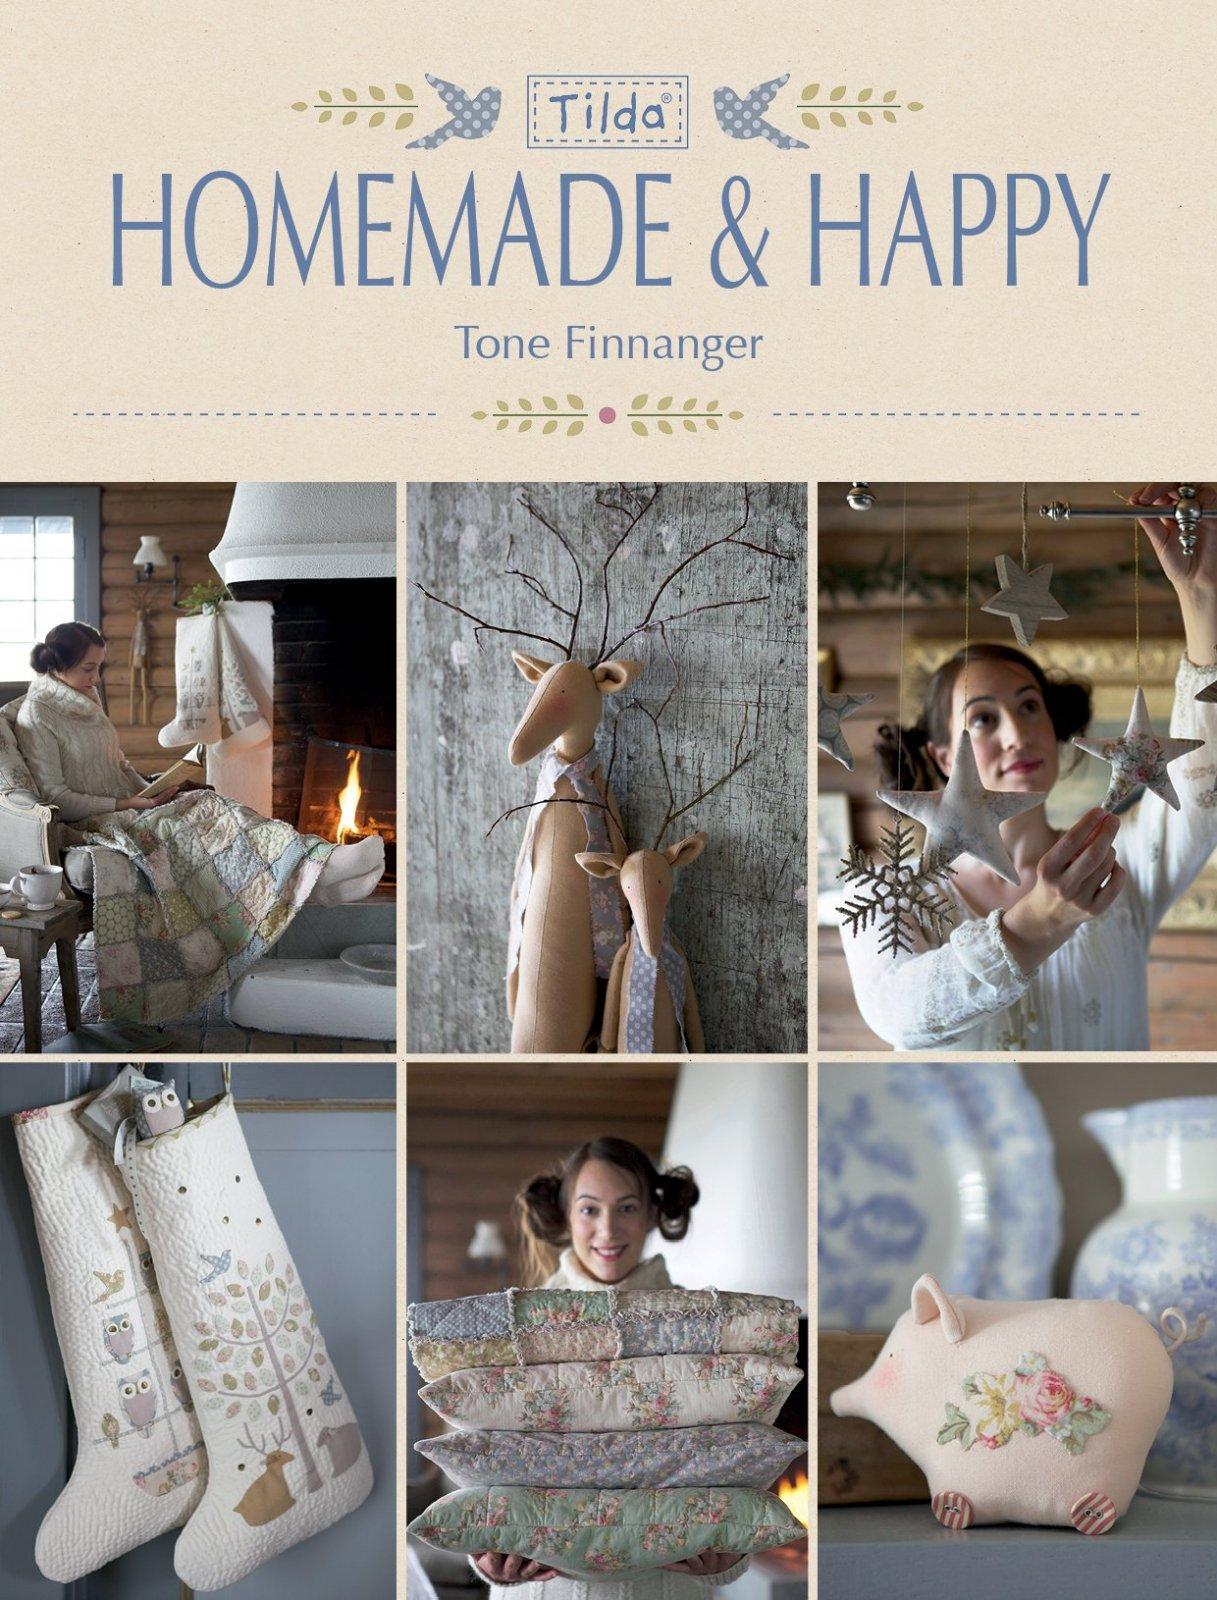 Tilda - Homemade & Happy Pattern Book